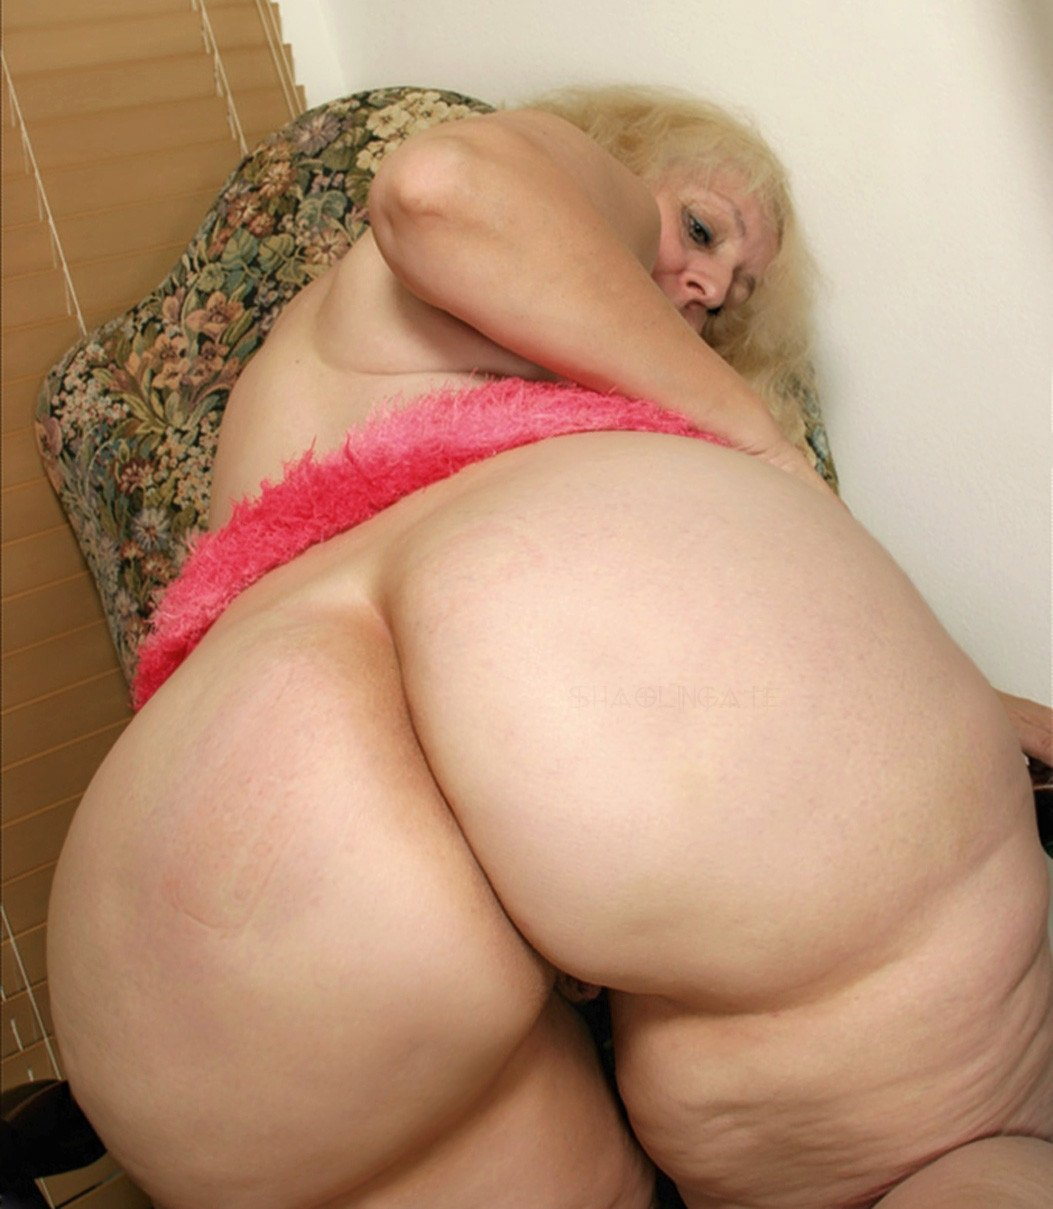 Мама Жопа Порно Фотография